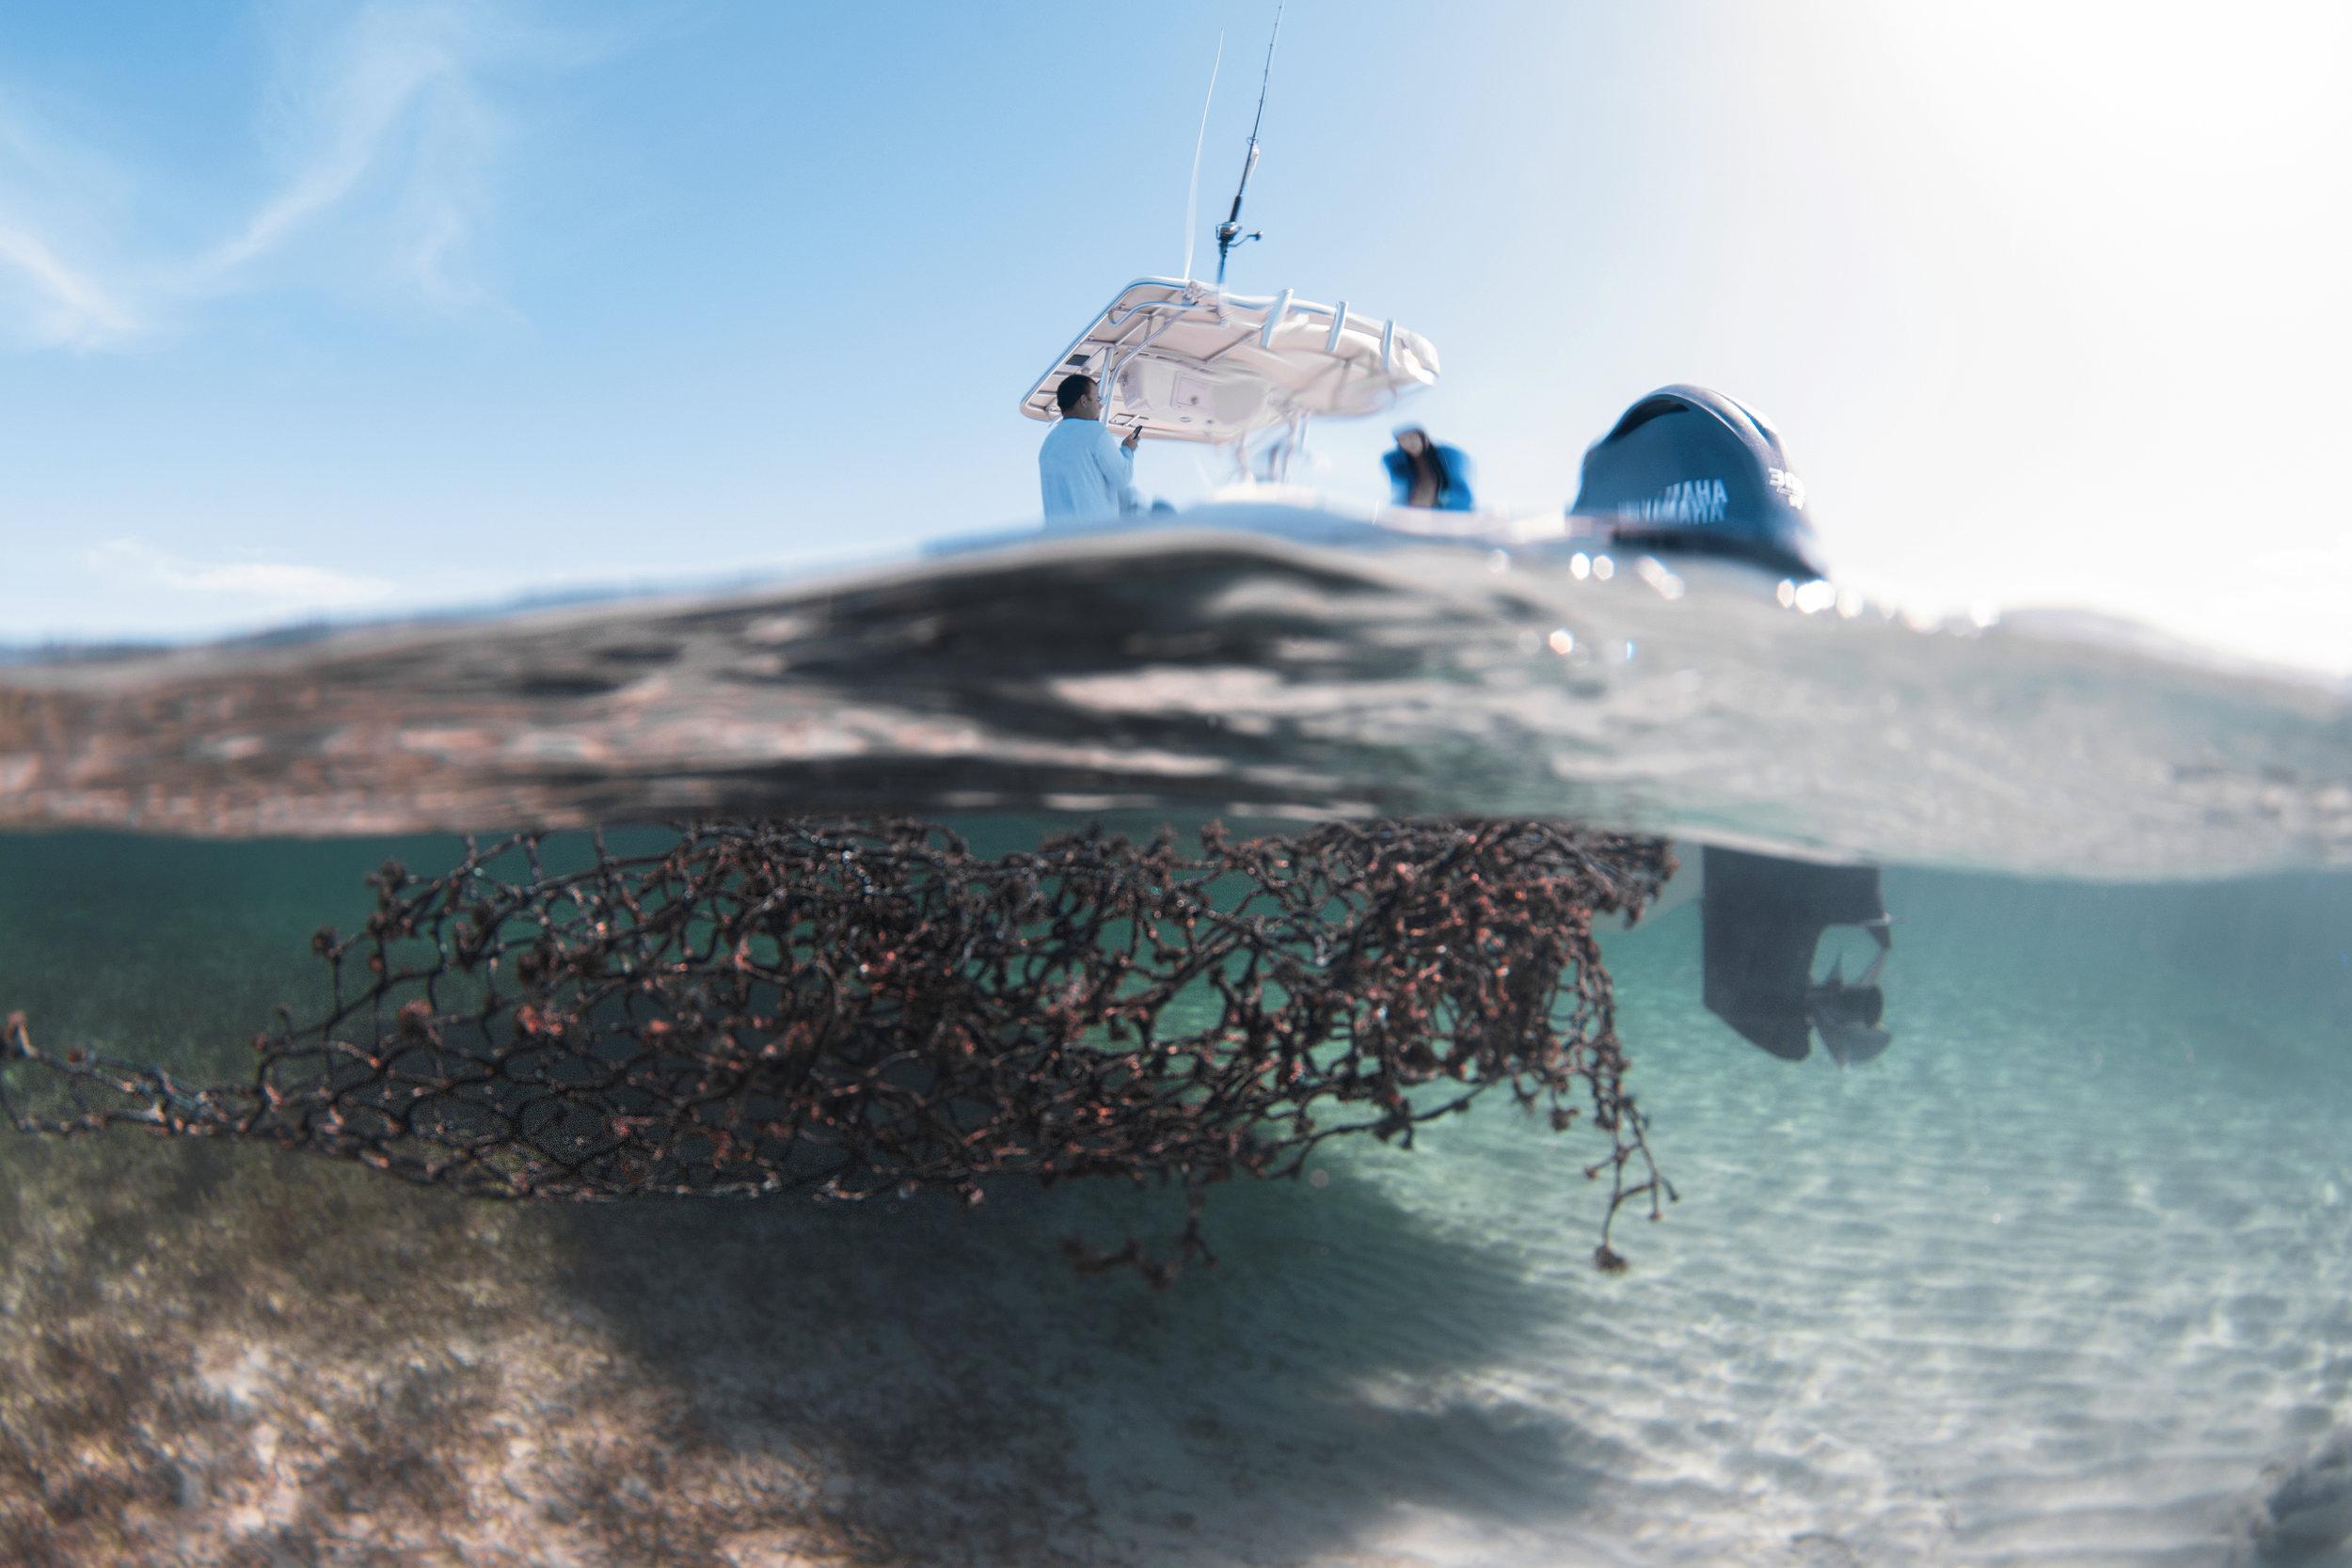 A ghost net the team retrieved from the ocean